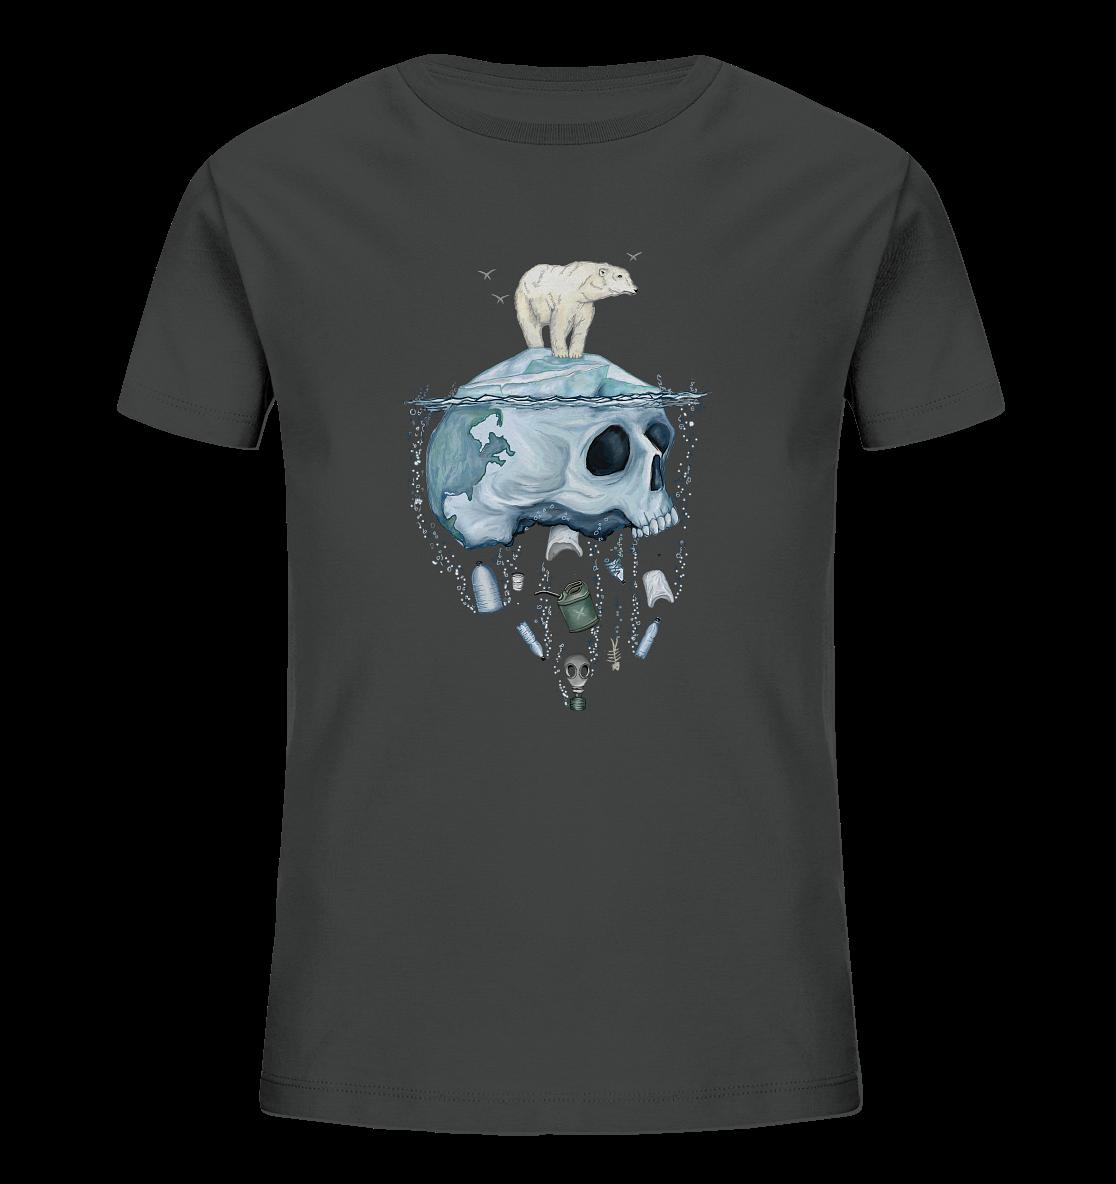 front-kids-organic-shirt-444545-1116x-2.png